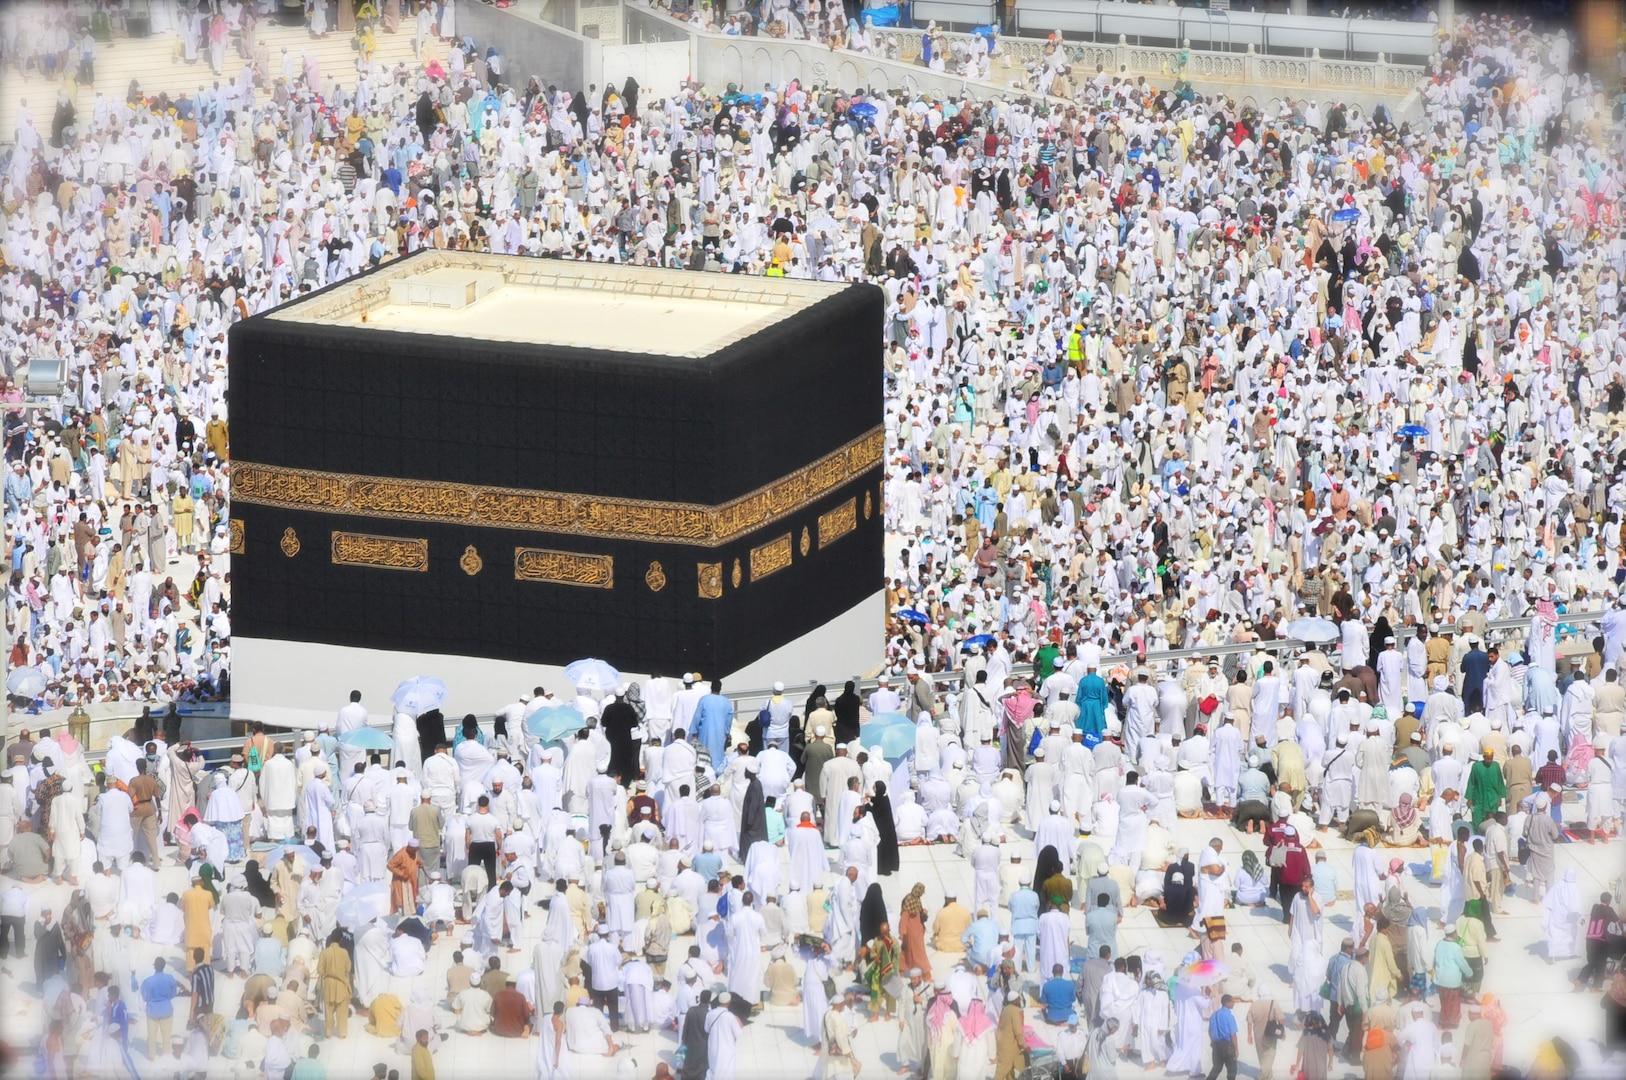 The Kaaba and the beginning of the hajj in Mecca, Saudi Arabia.